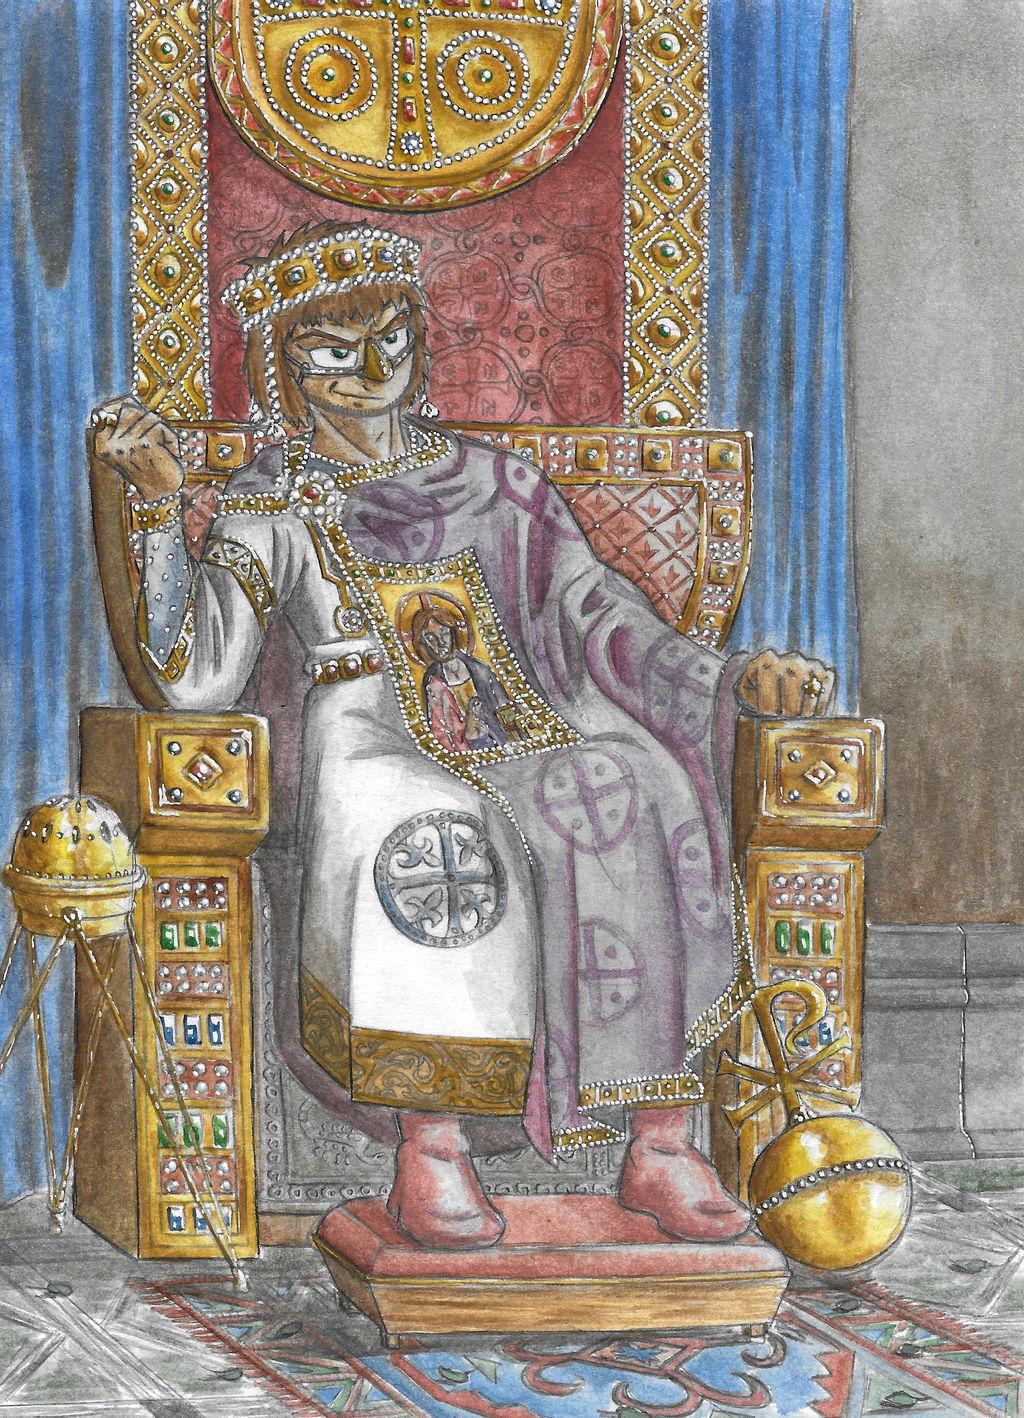 justinian_ii__byzantine_comic_preview__by_ediacar_dceji2m-fullview